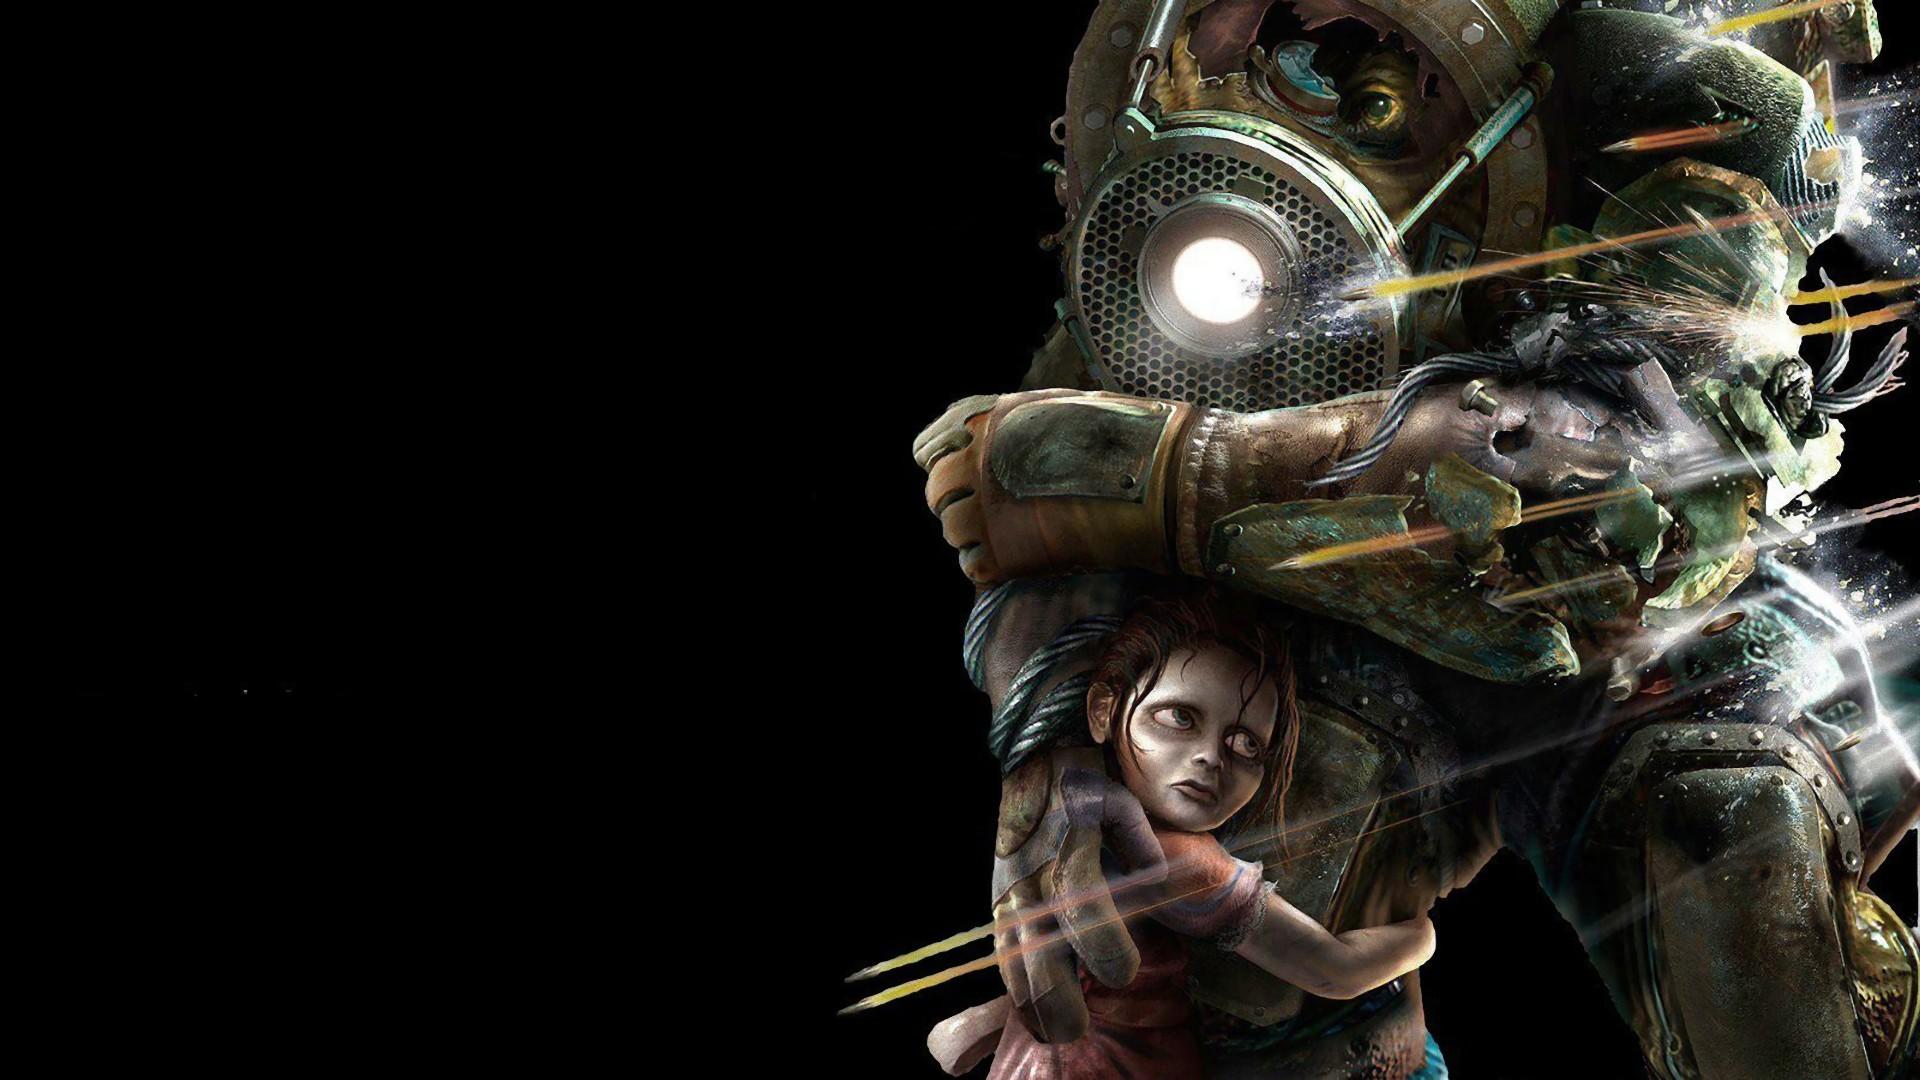 Wallpaper Video Games Big Daddy Bioshock Screenshot